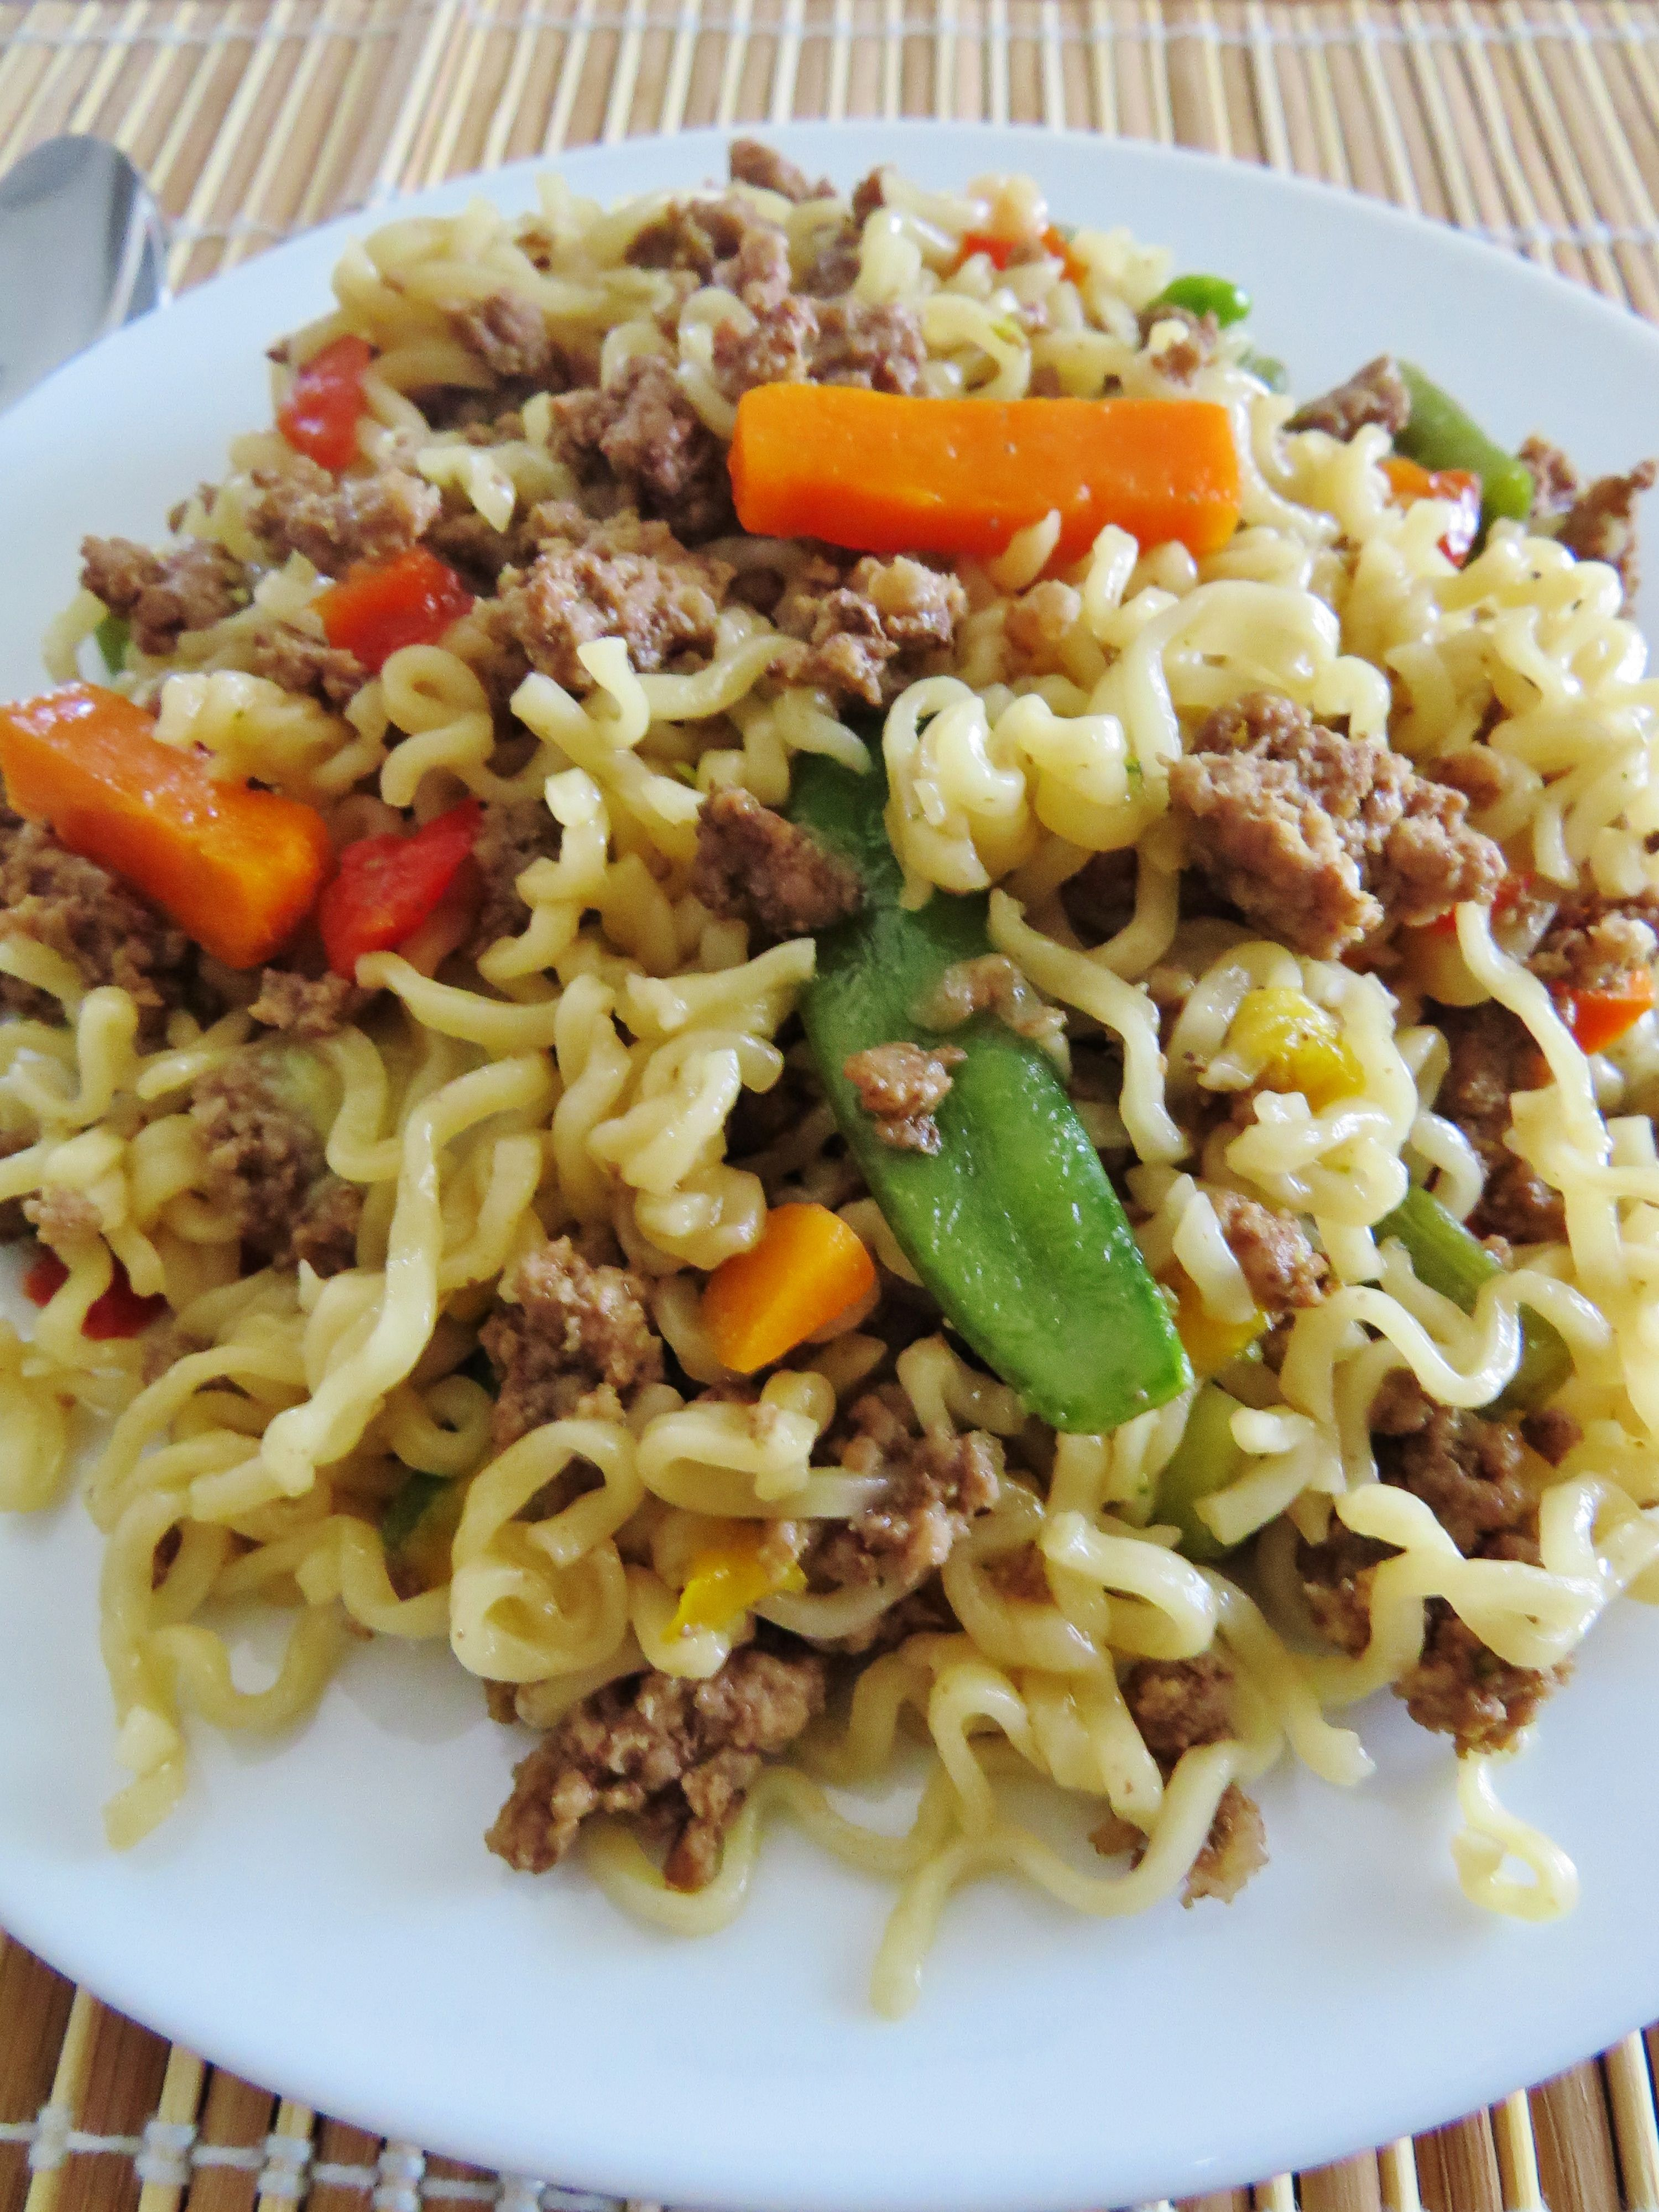 Simple Food Recipes Dinner Ground Beef